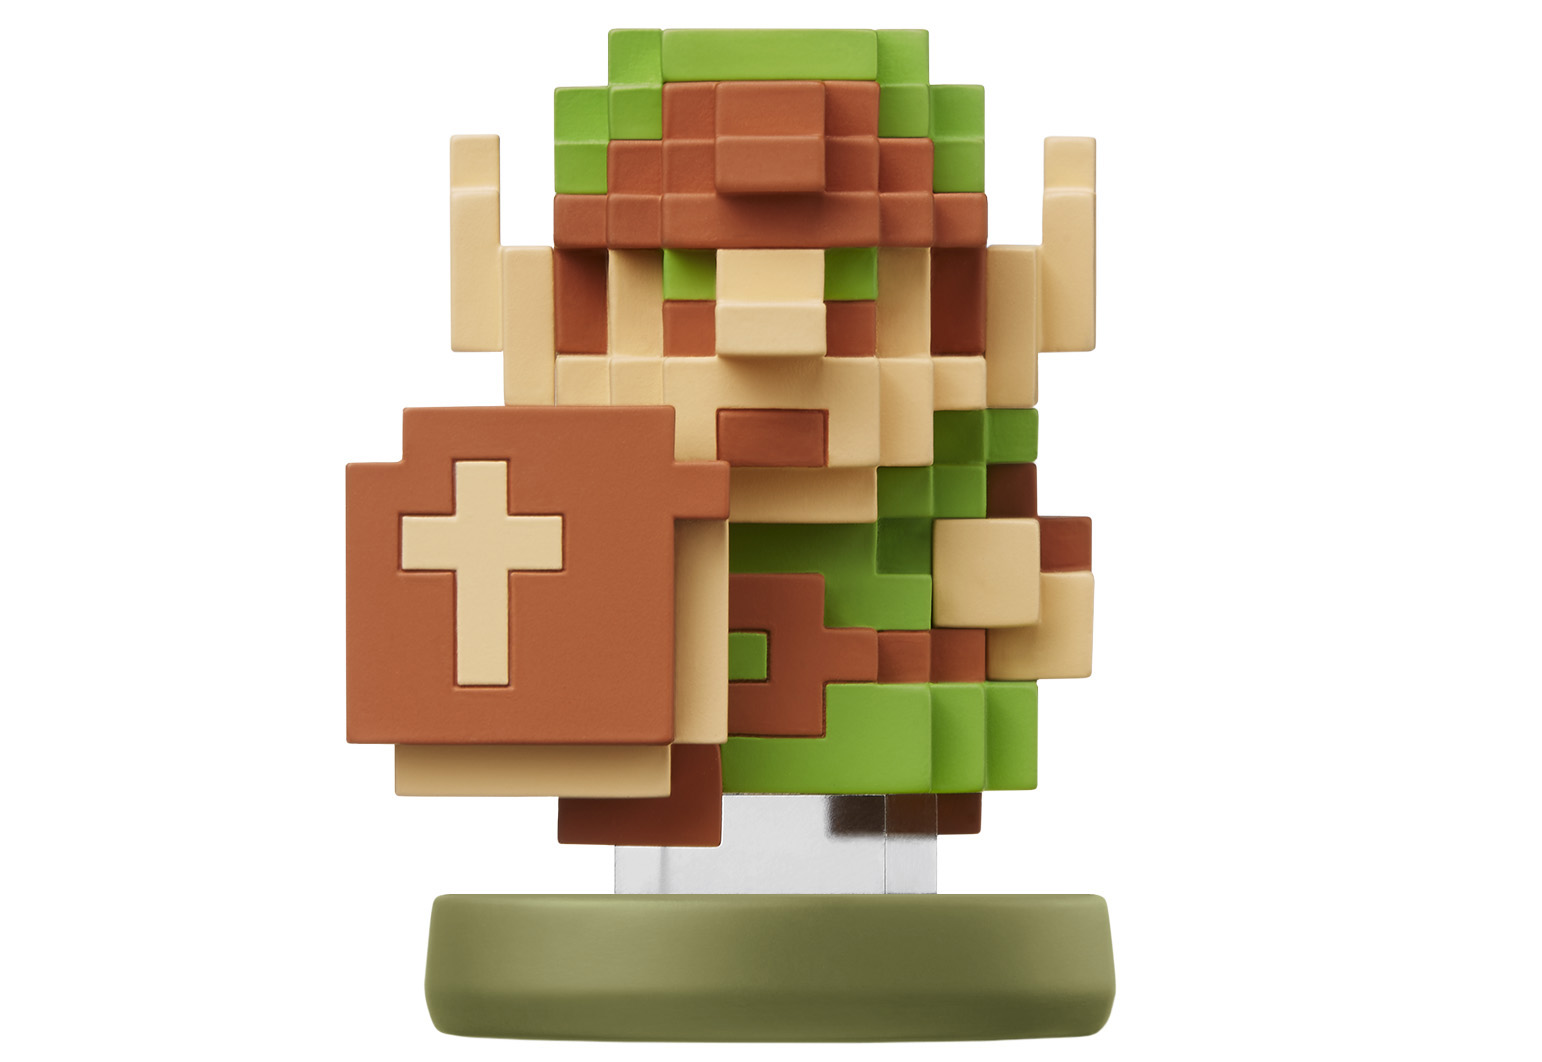 amiibo_Zelda30th_char06_8bit